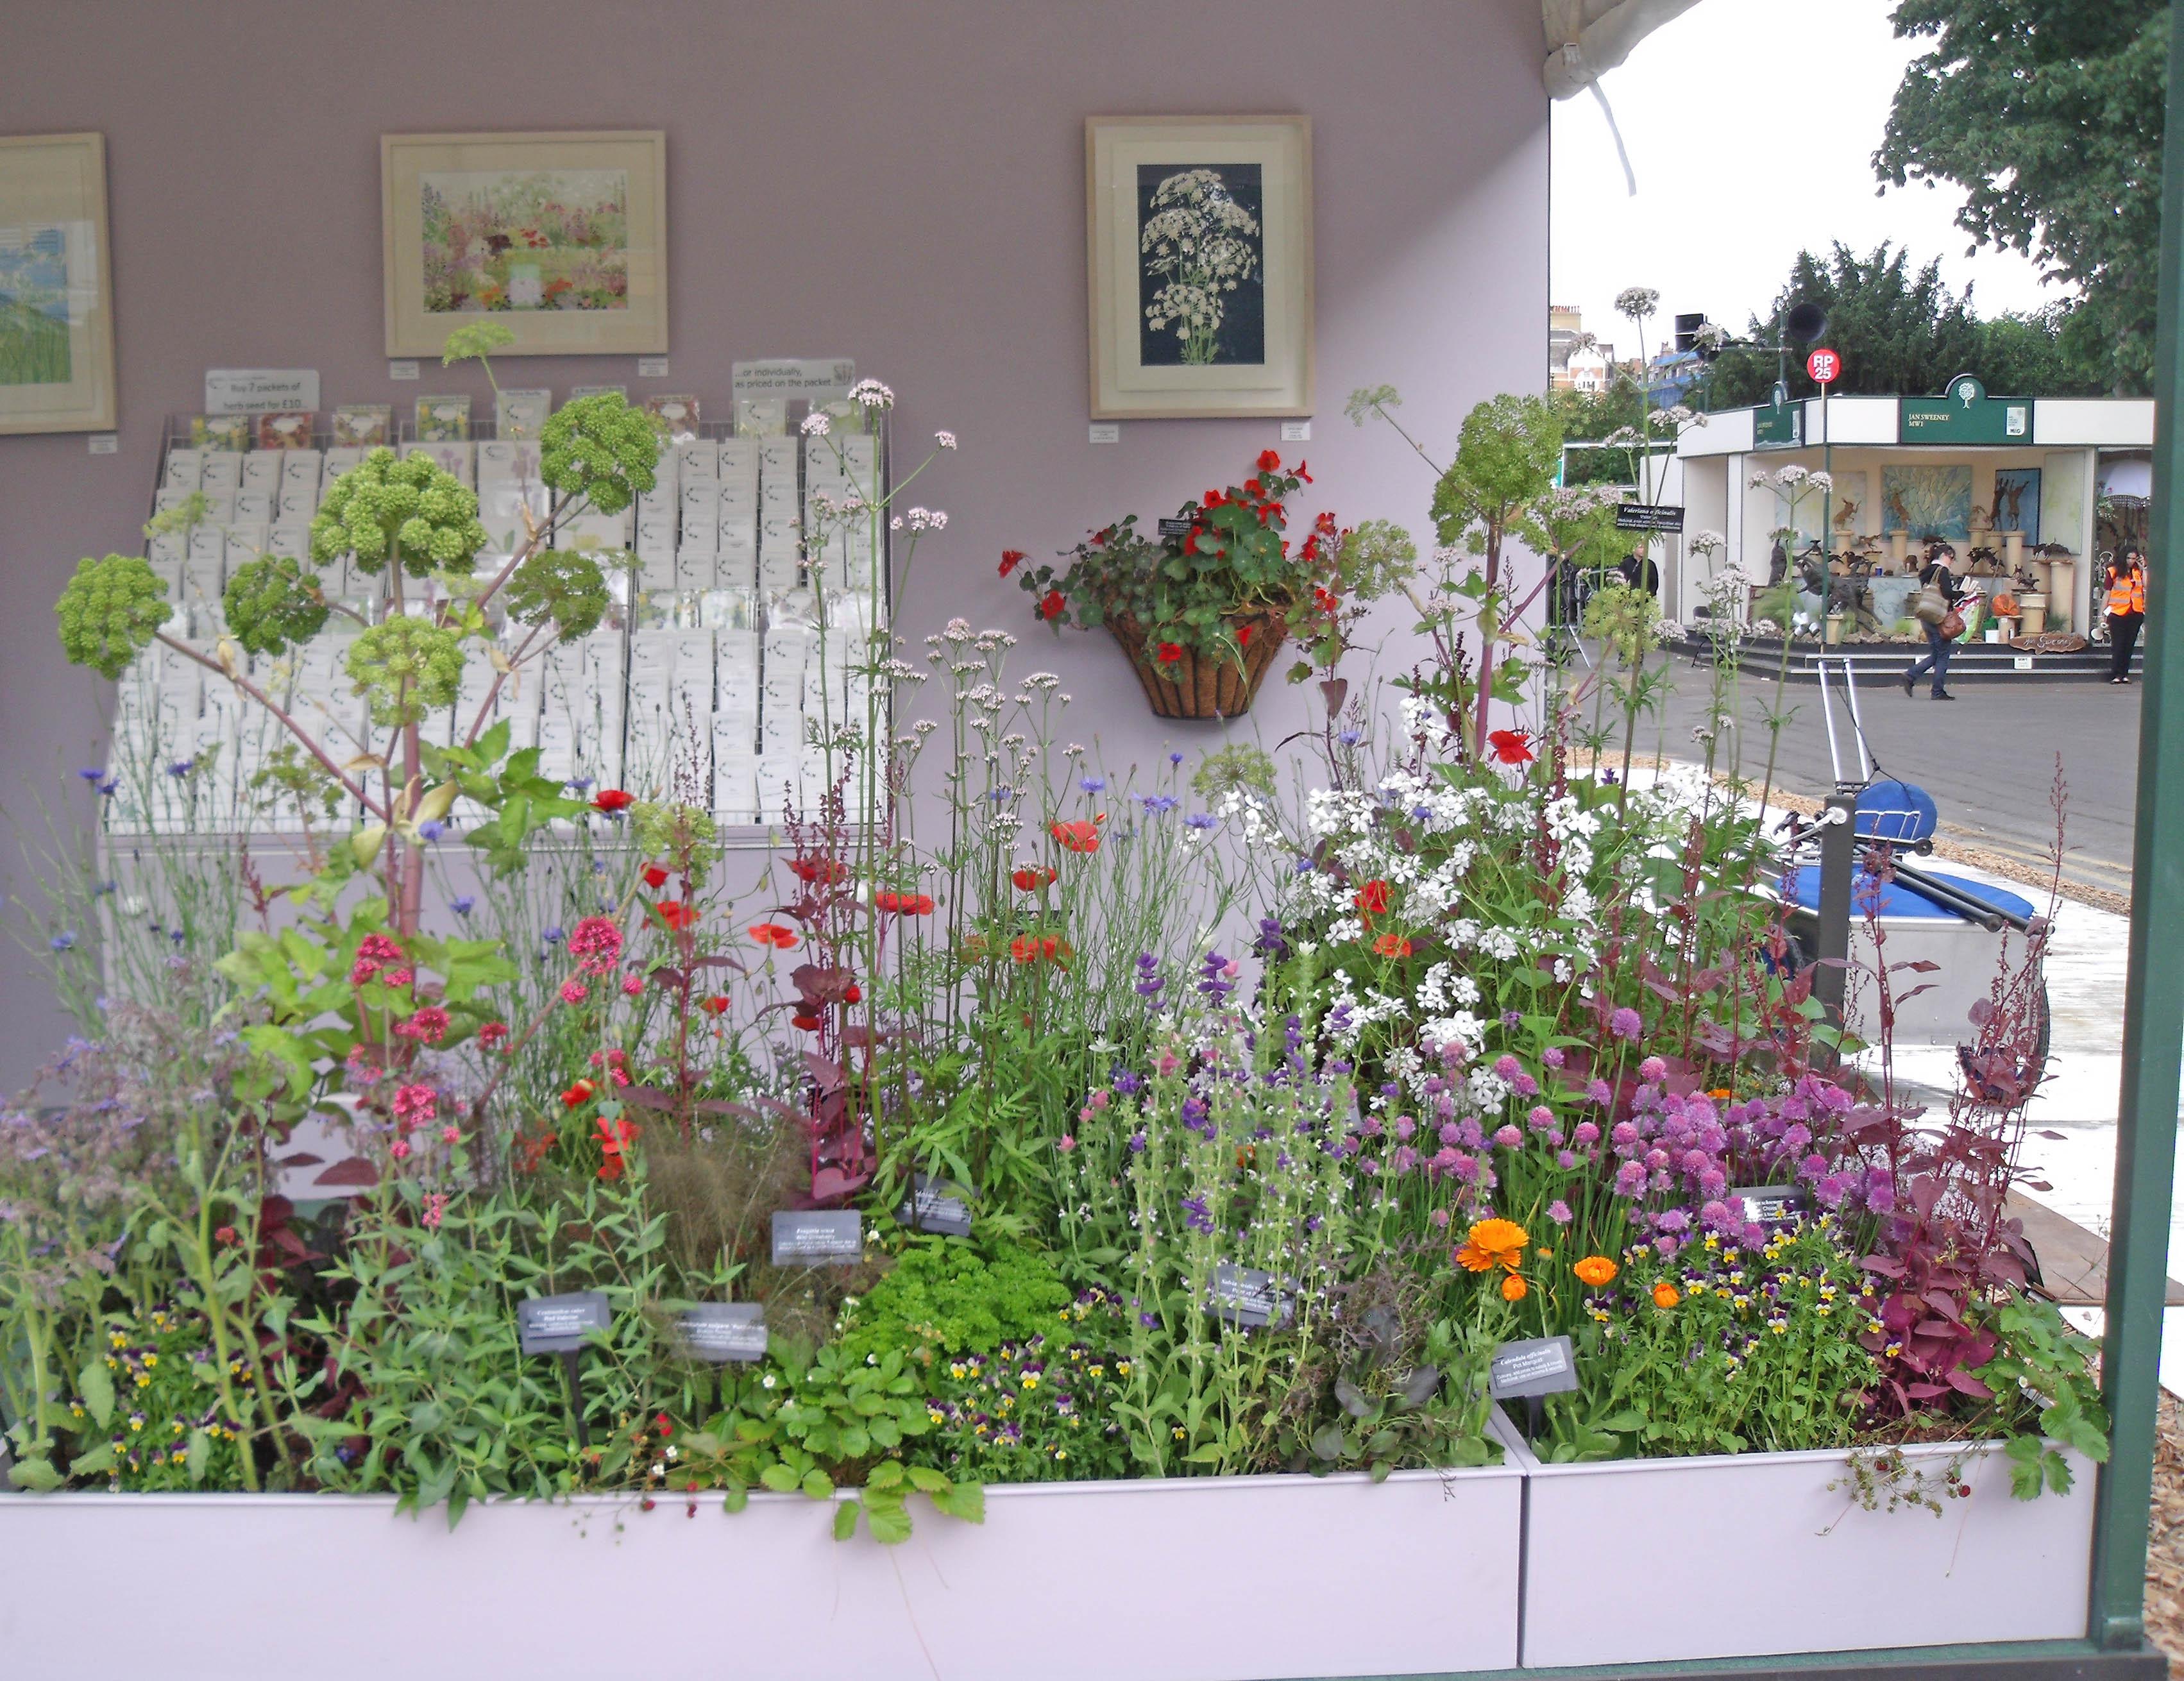 Stevia   Jekka's Herb Farm on autumn floral border design, border rock garden design, border flower design, plant border design, border garden design ideas, border shade garden design, border christmas design,